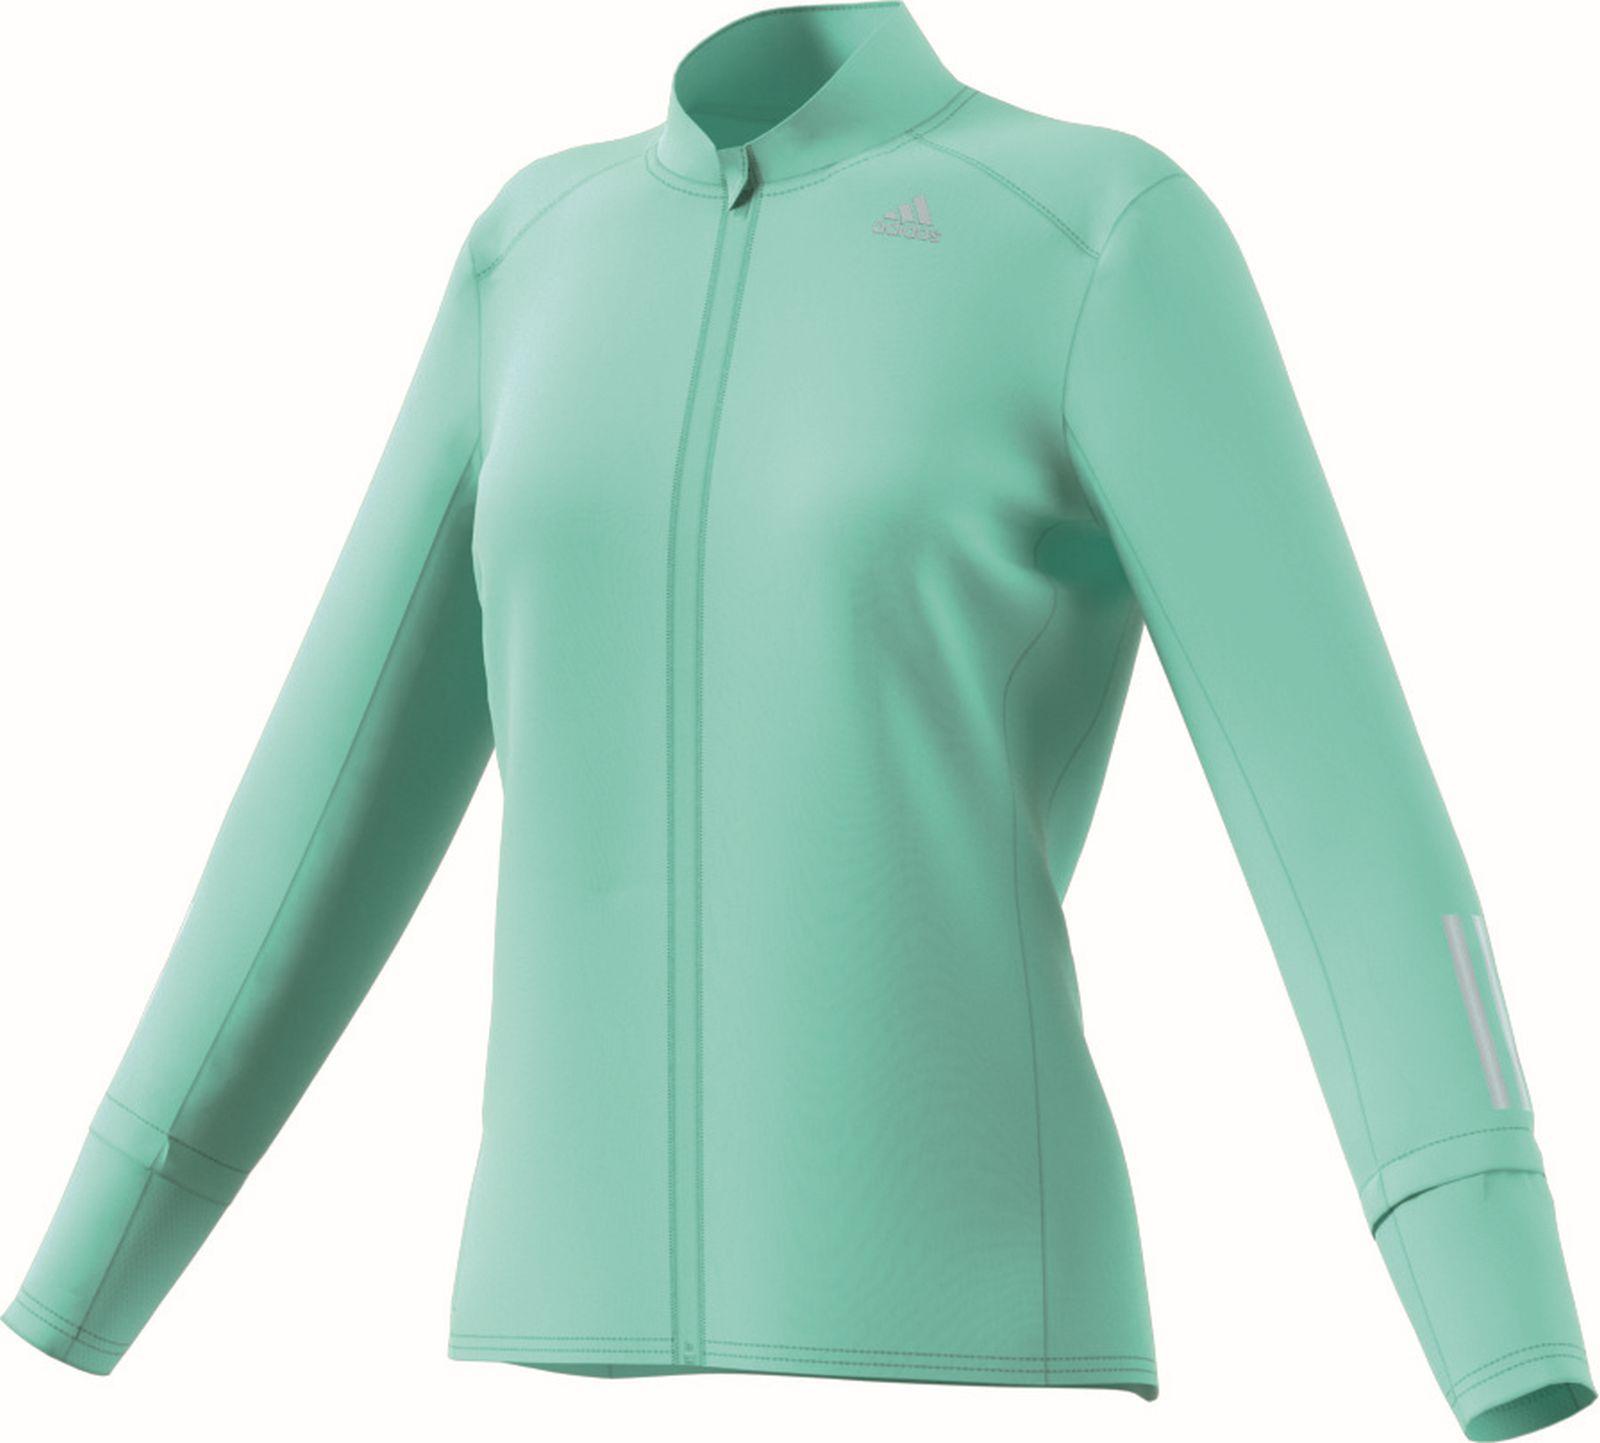 Details zu adidas Performance Damen Running Laufjacke Response Jacket W clear mint